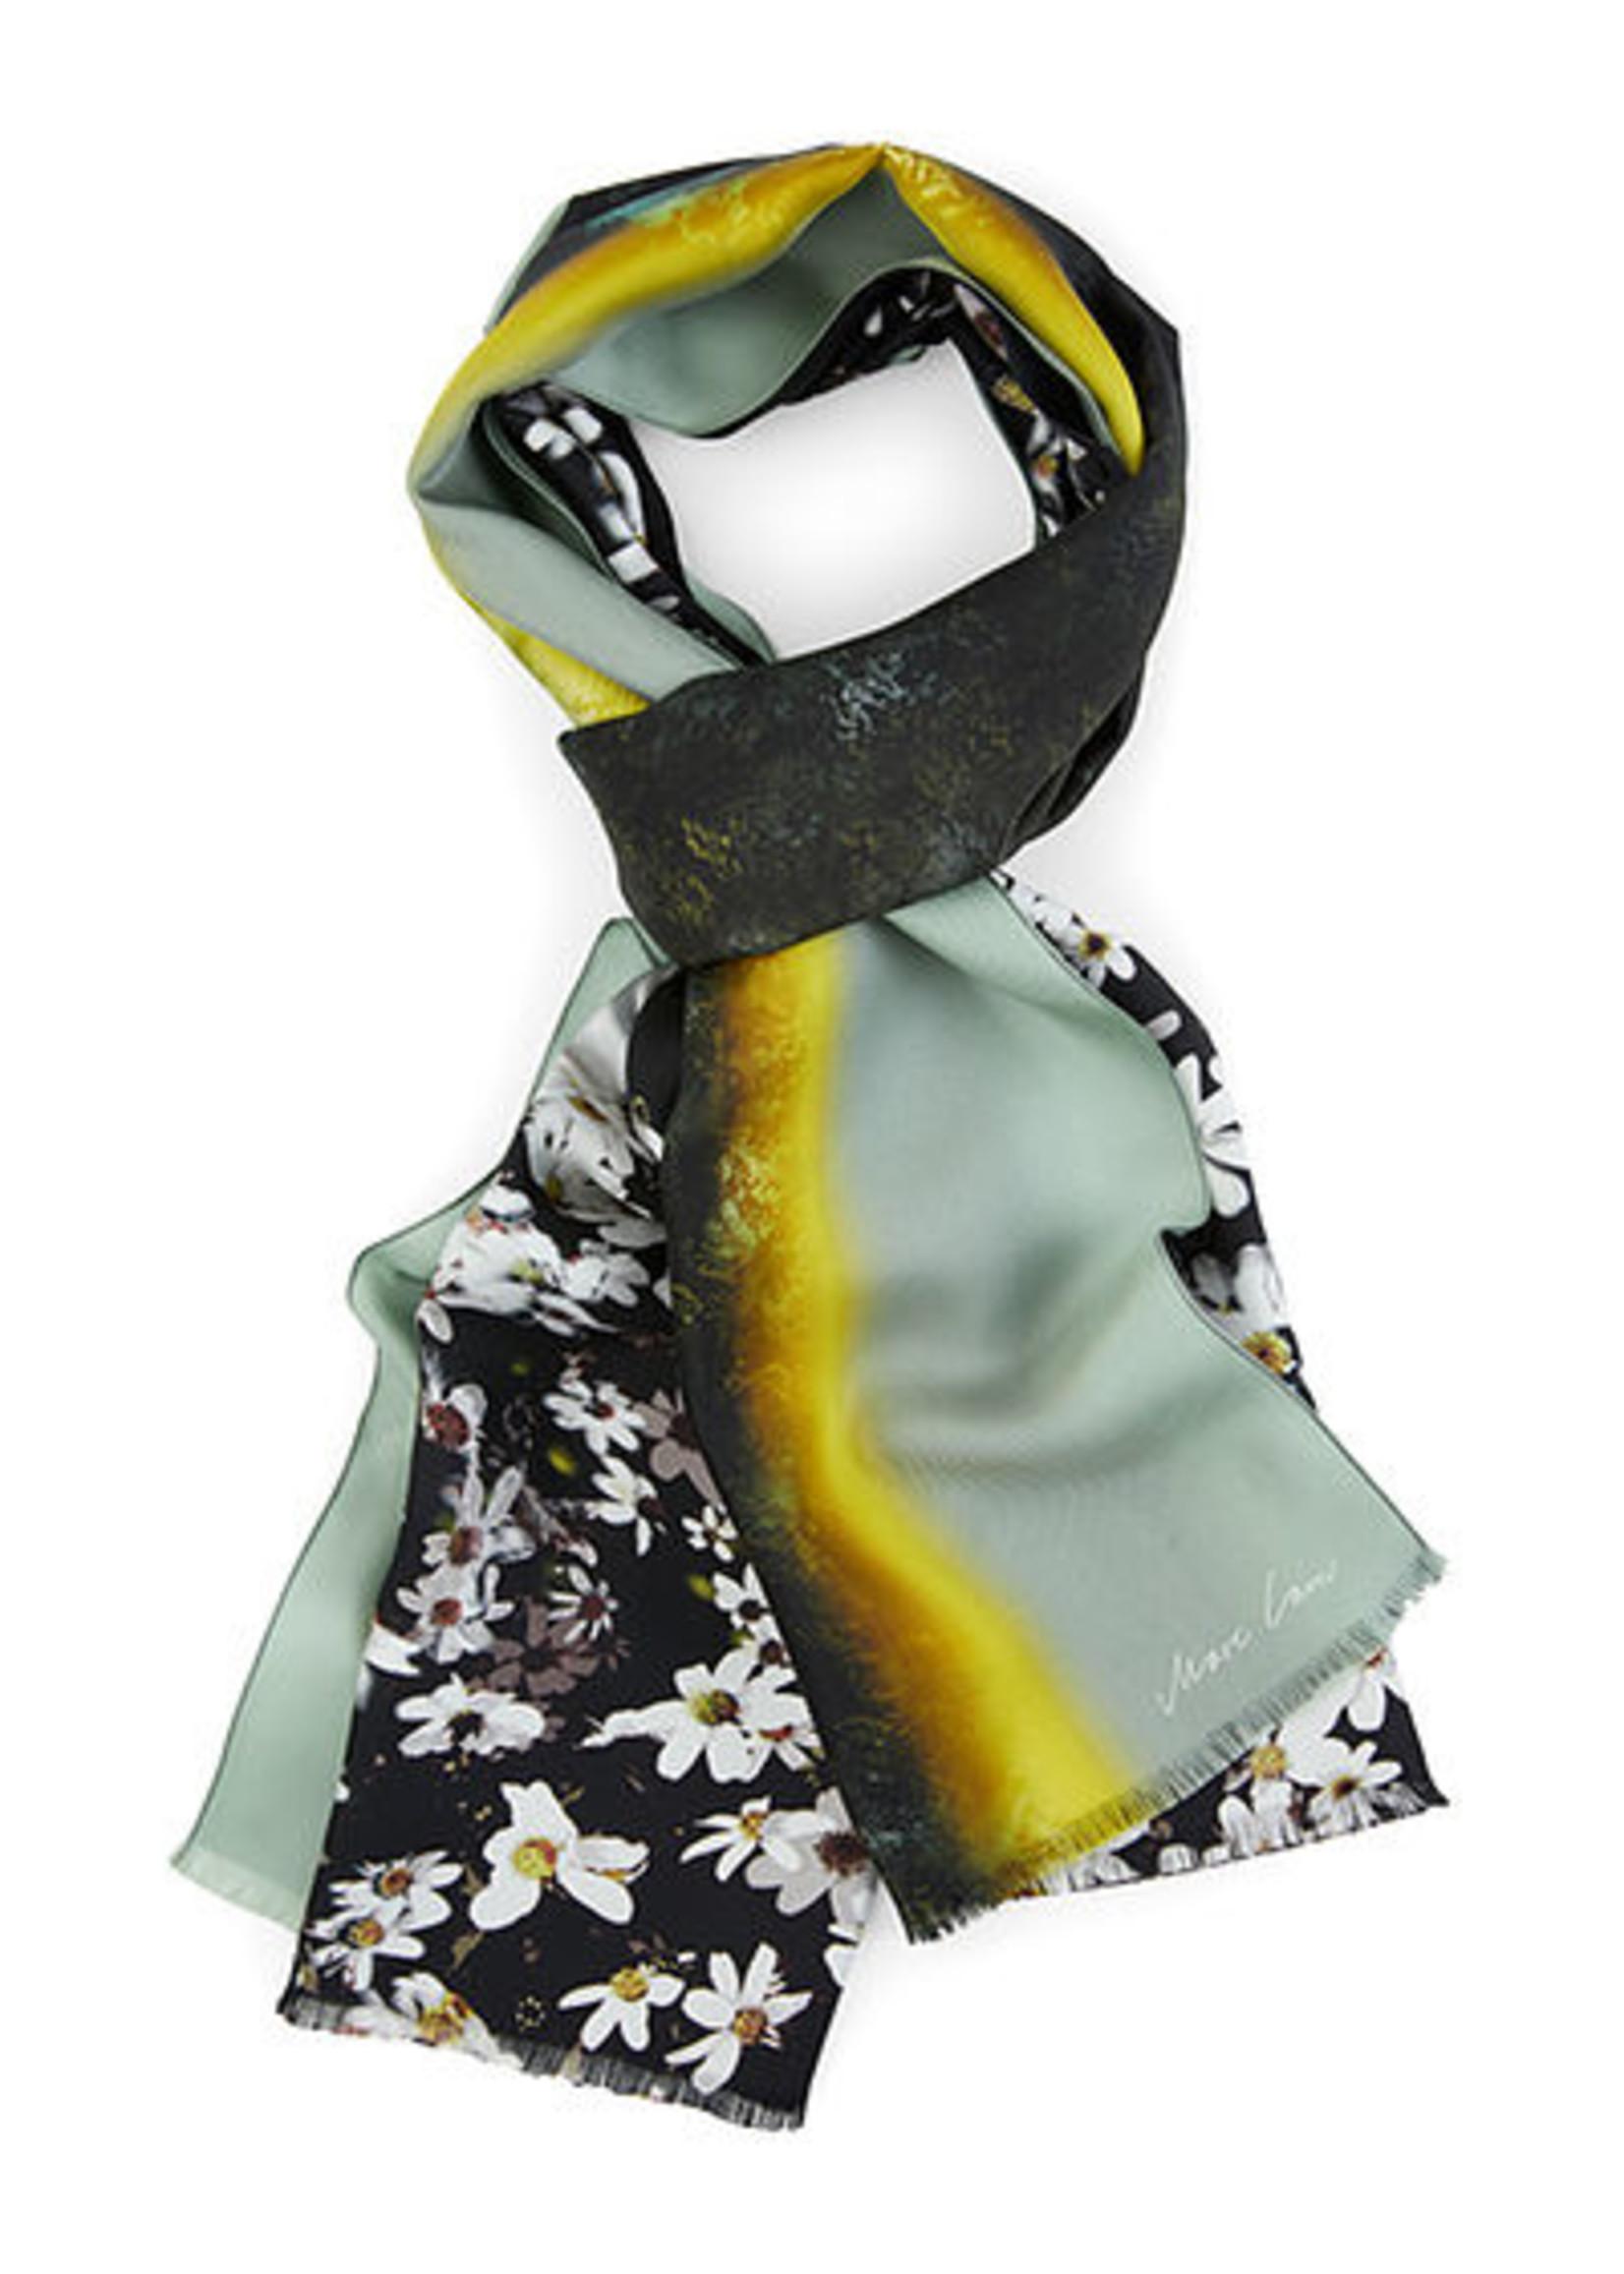 Sjaal RC B4.07 Z25 olive drab